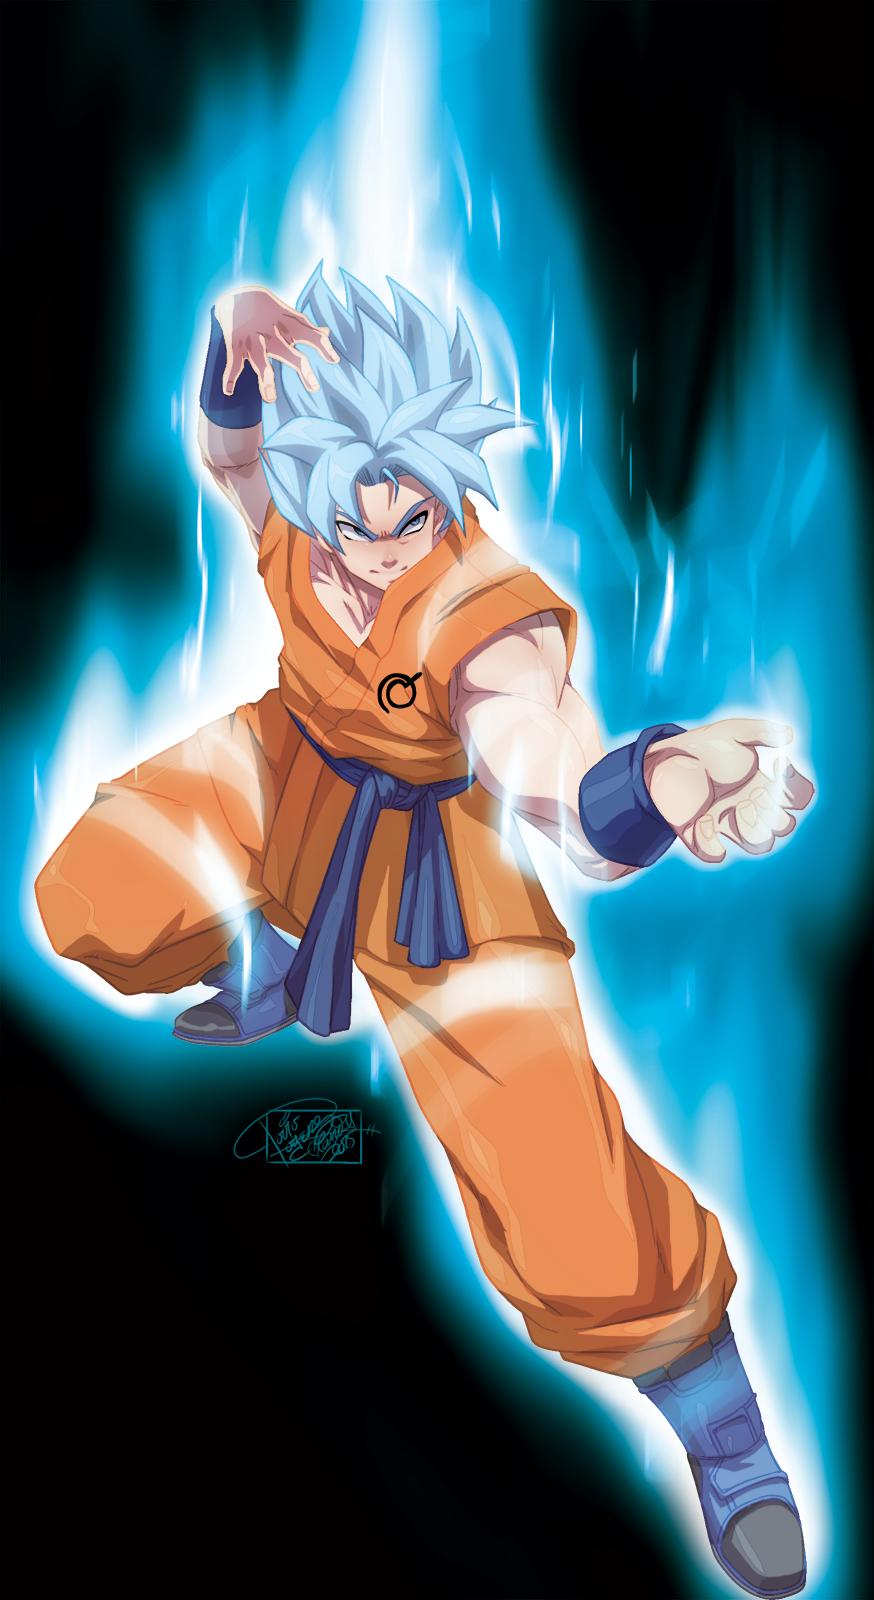 Anime Picture Search Engine 1boy Aura Blue Eyes Blue Hair Boots Dougi Dragon Ball Dragon Ball Z Fighting Stance Full Goku Super Saiyan Dragon Ball Art Anime